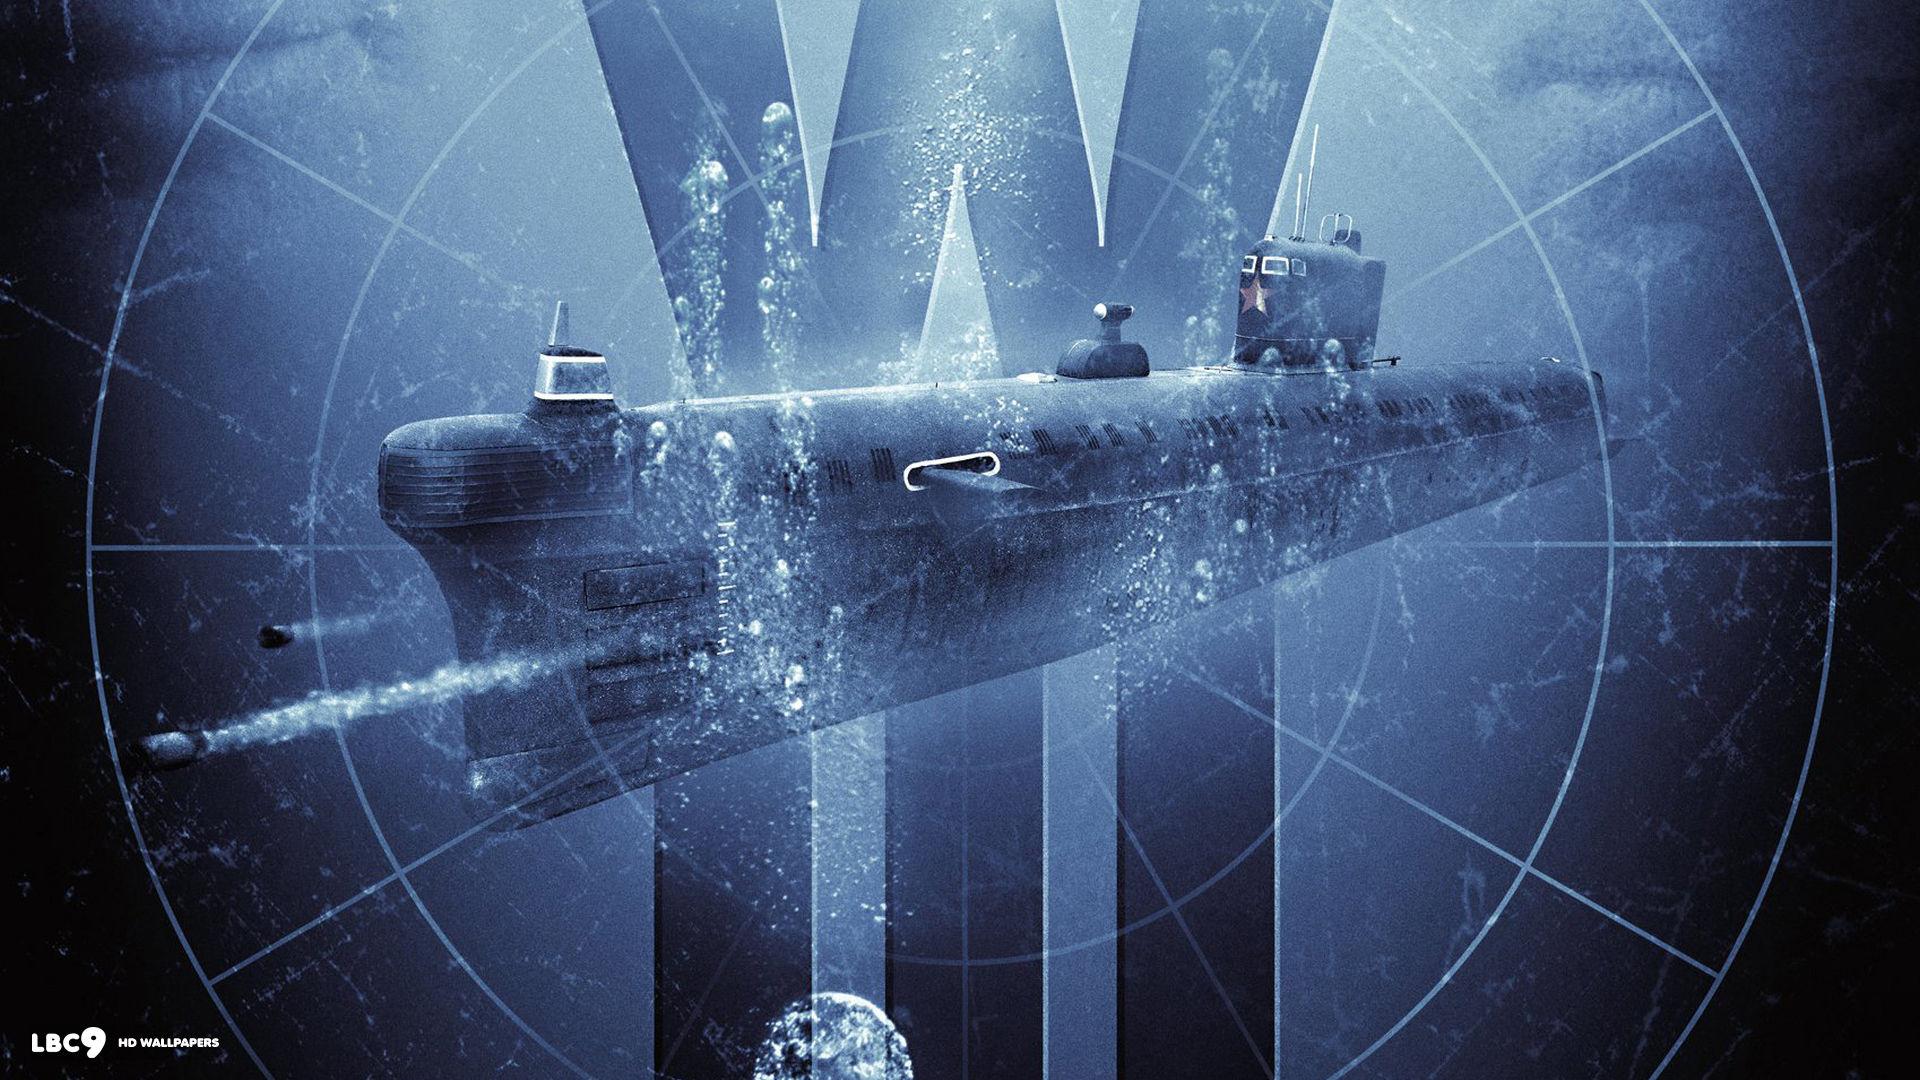 submarine wallpaper 1920x1080